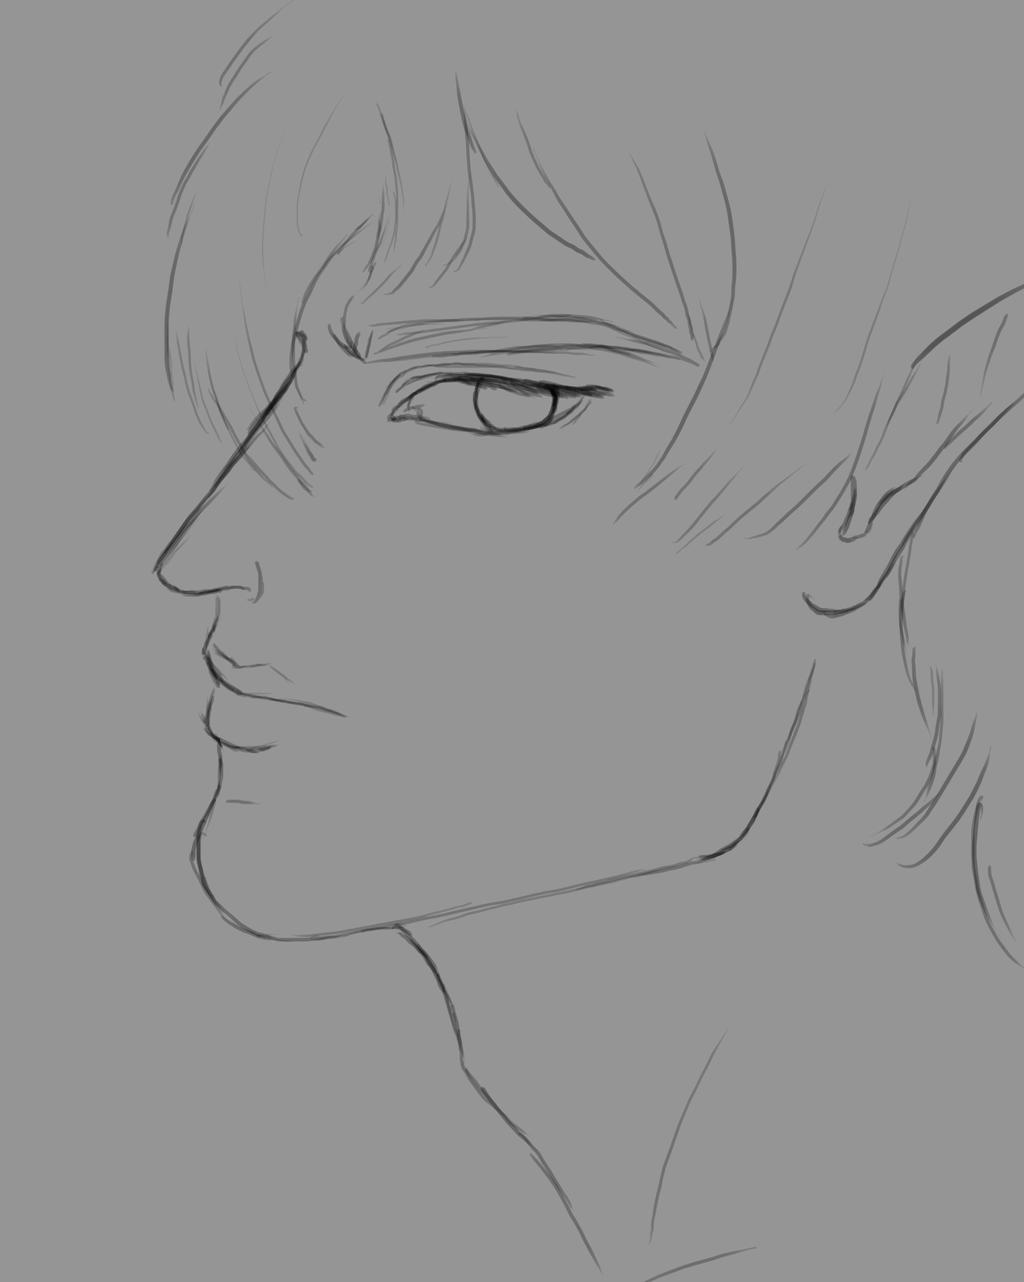 Elf Man Daily sketch #606 by GothicVampireFreak